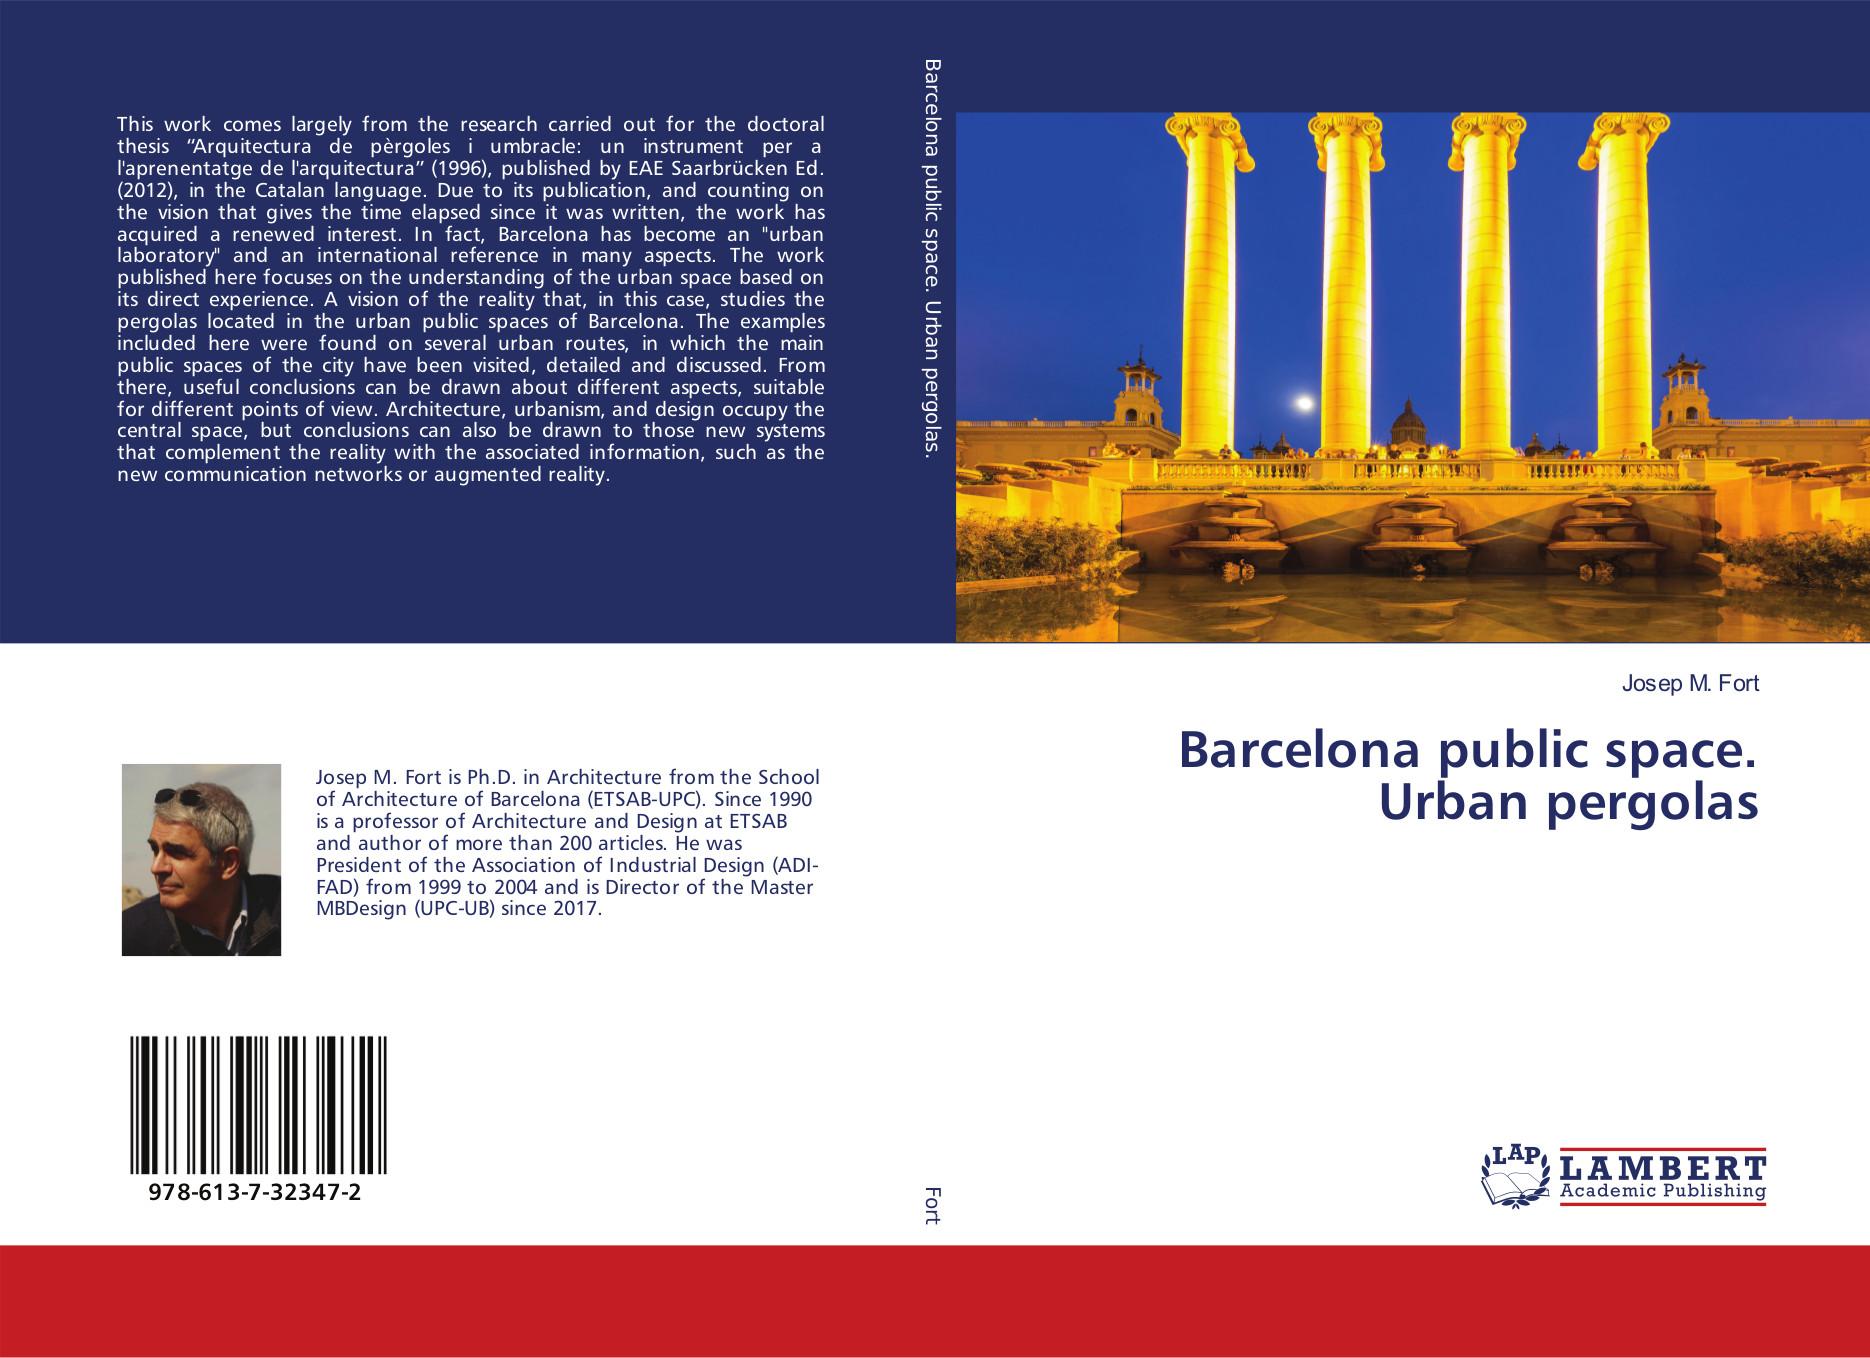 Portada-ISBN-978-613-7-32347-2-JMFort 1.jpg